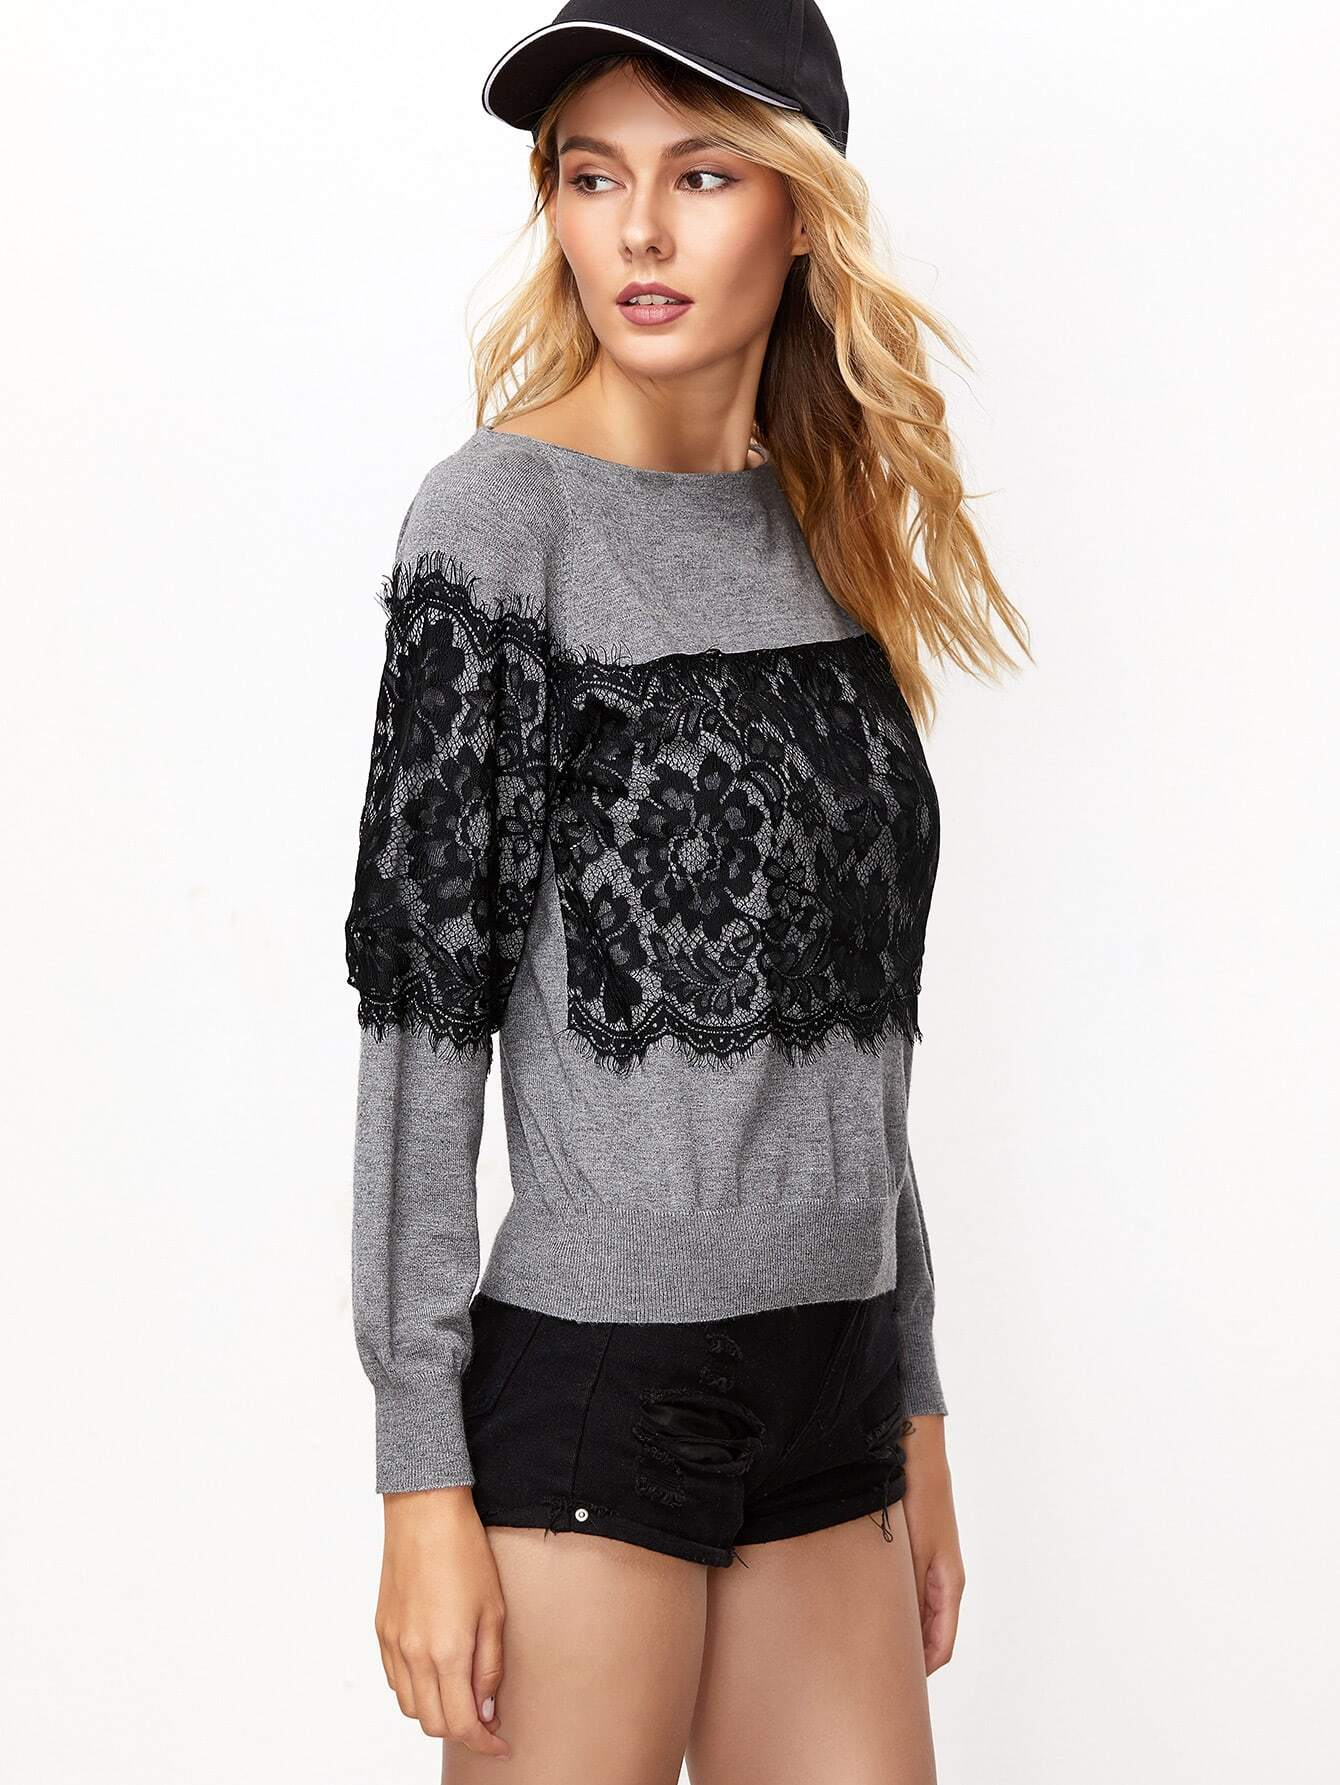 sweater161102450_2